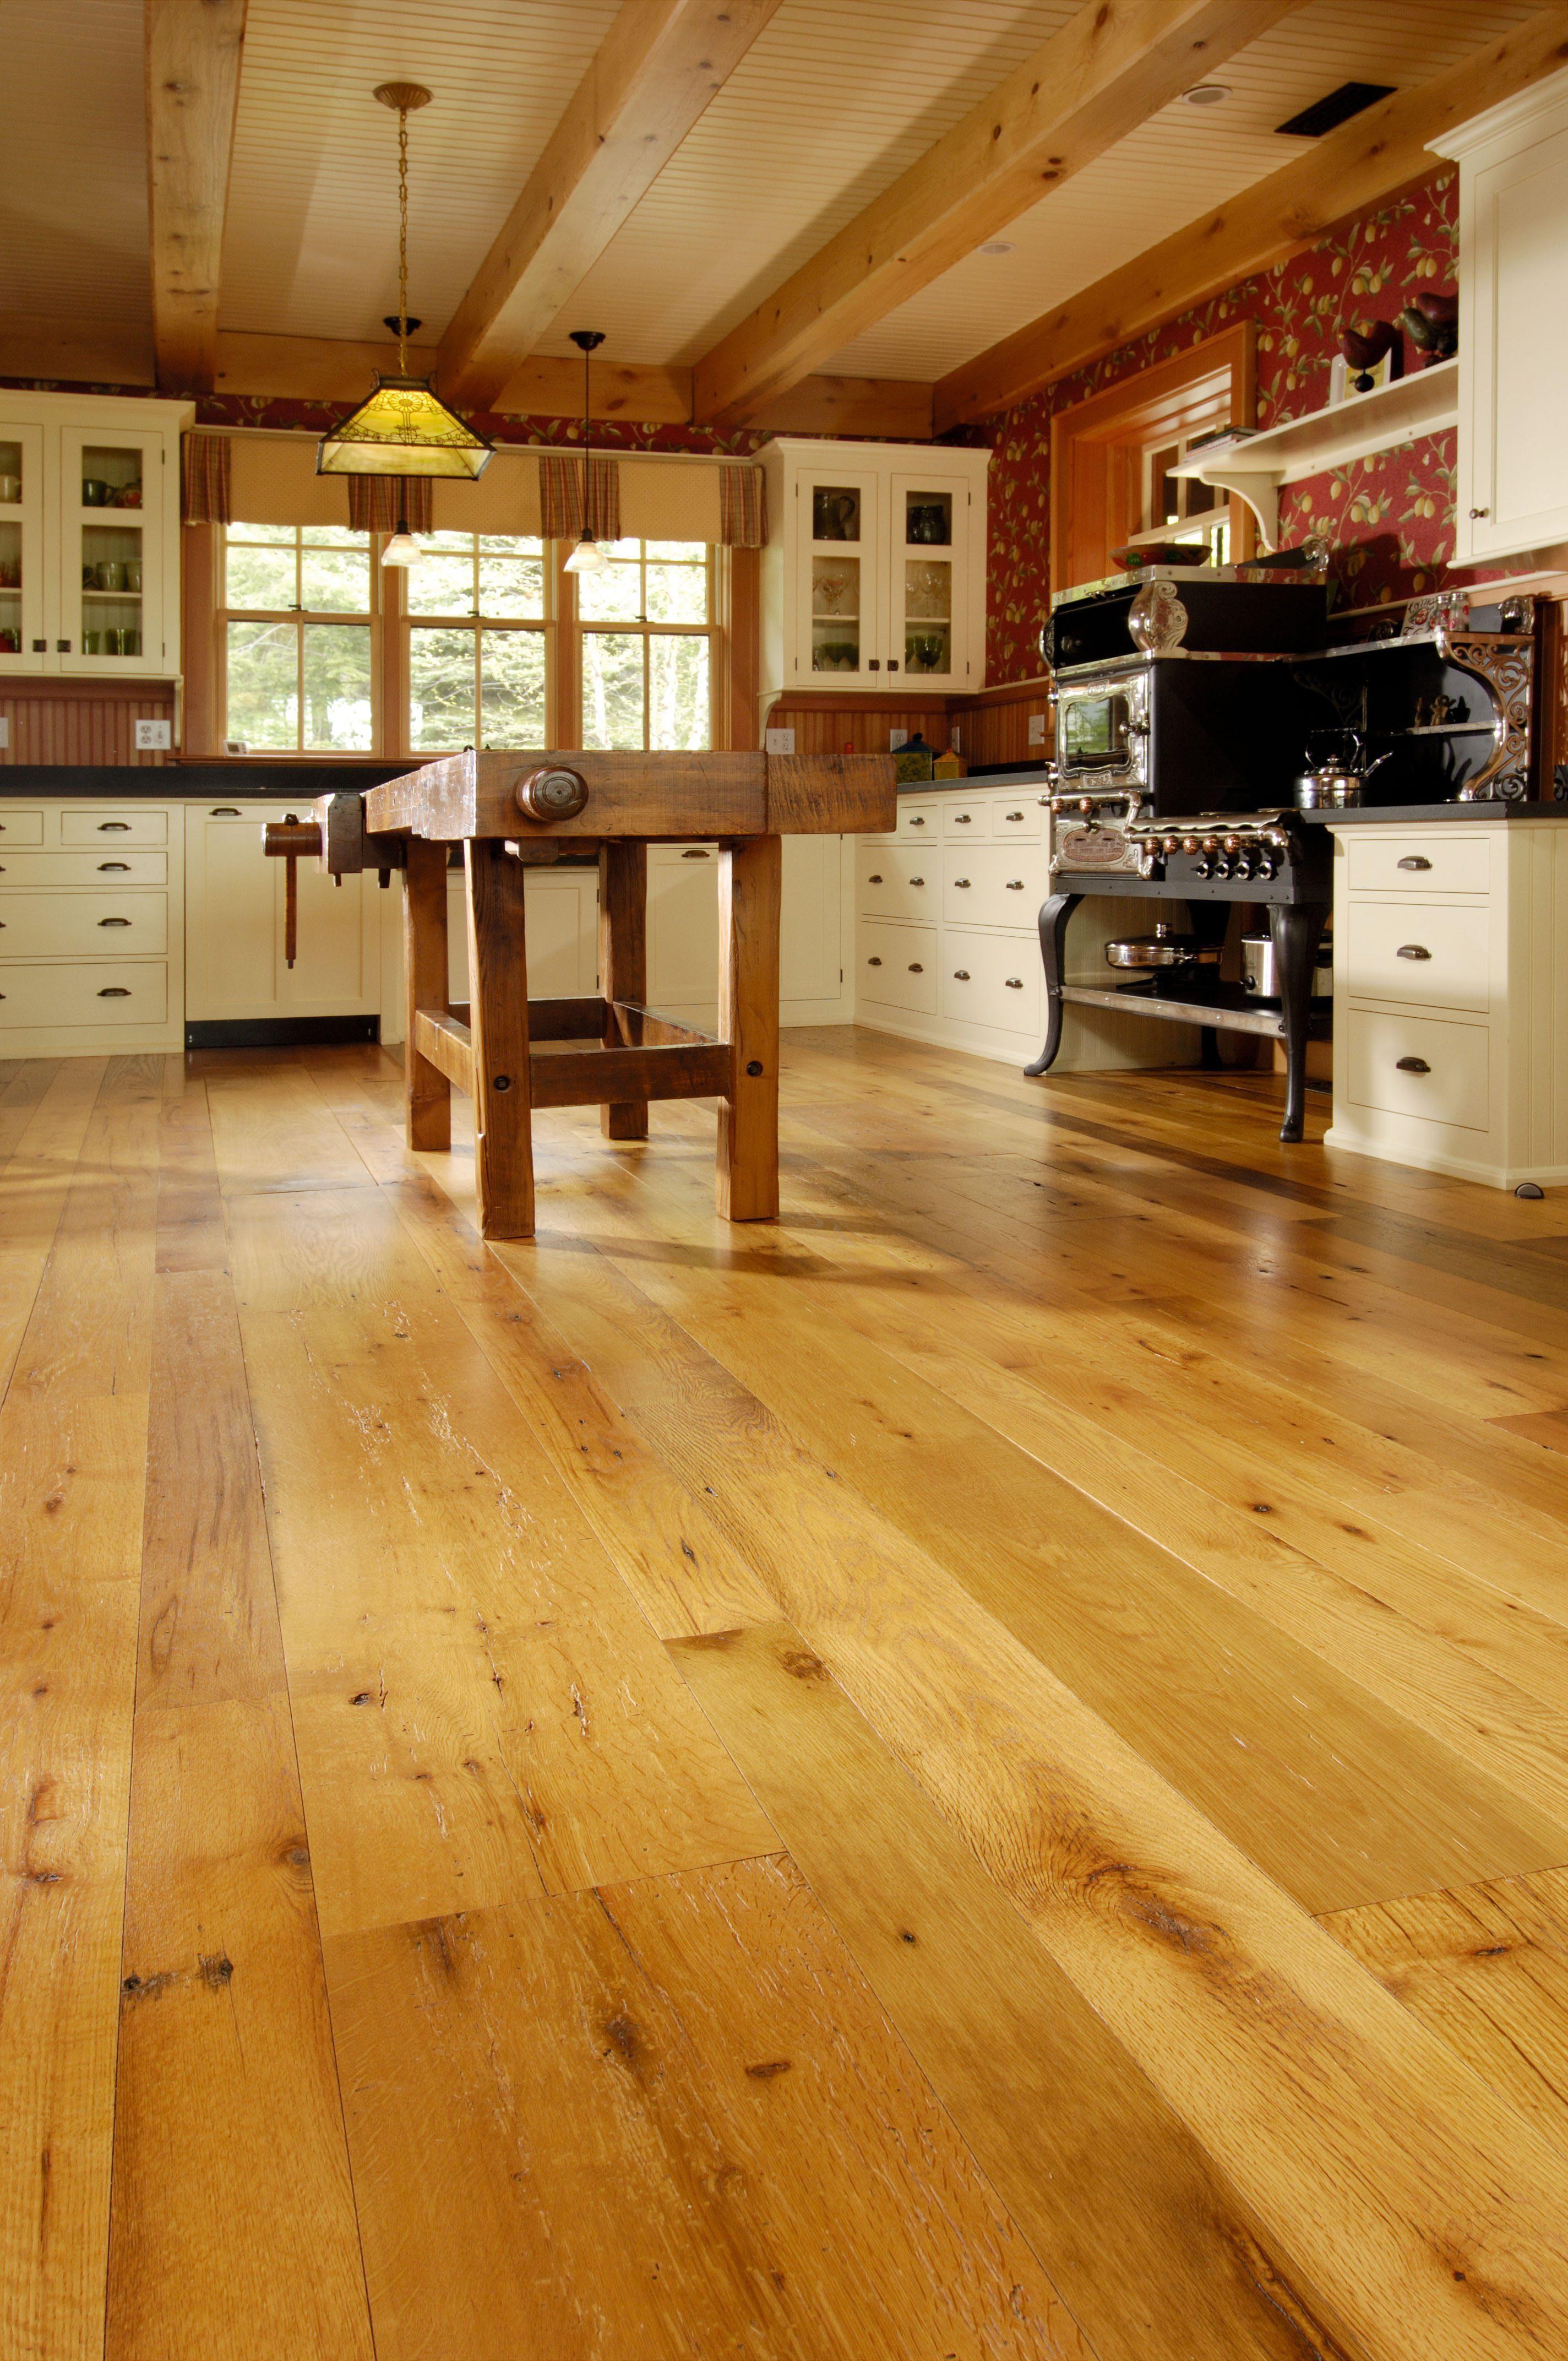 Reclaimed Oak Floors in Kitchen with Radiant Heat